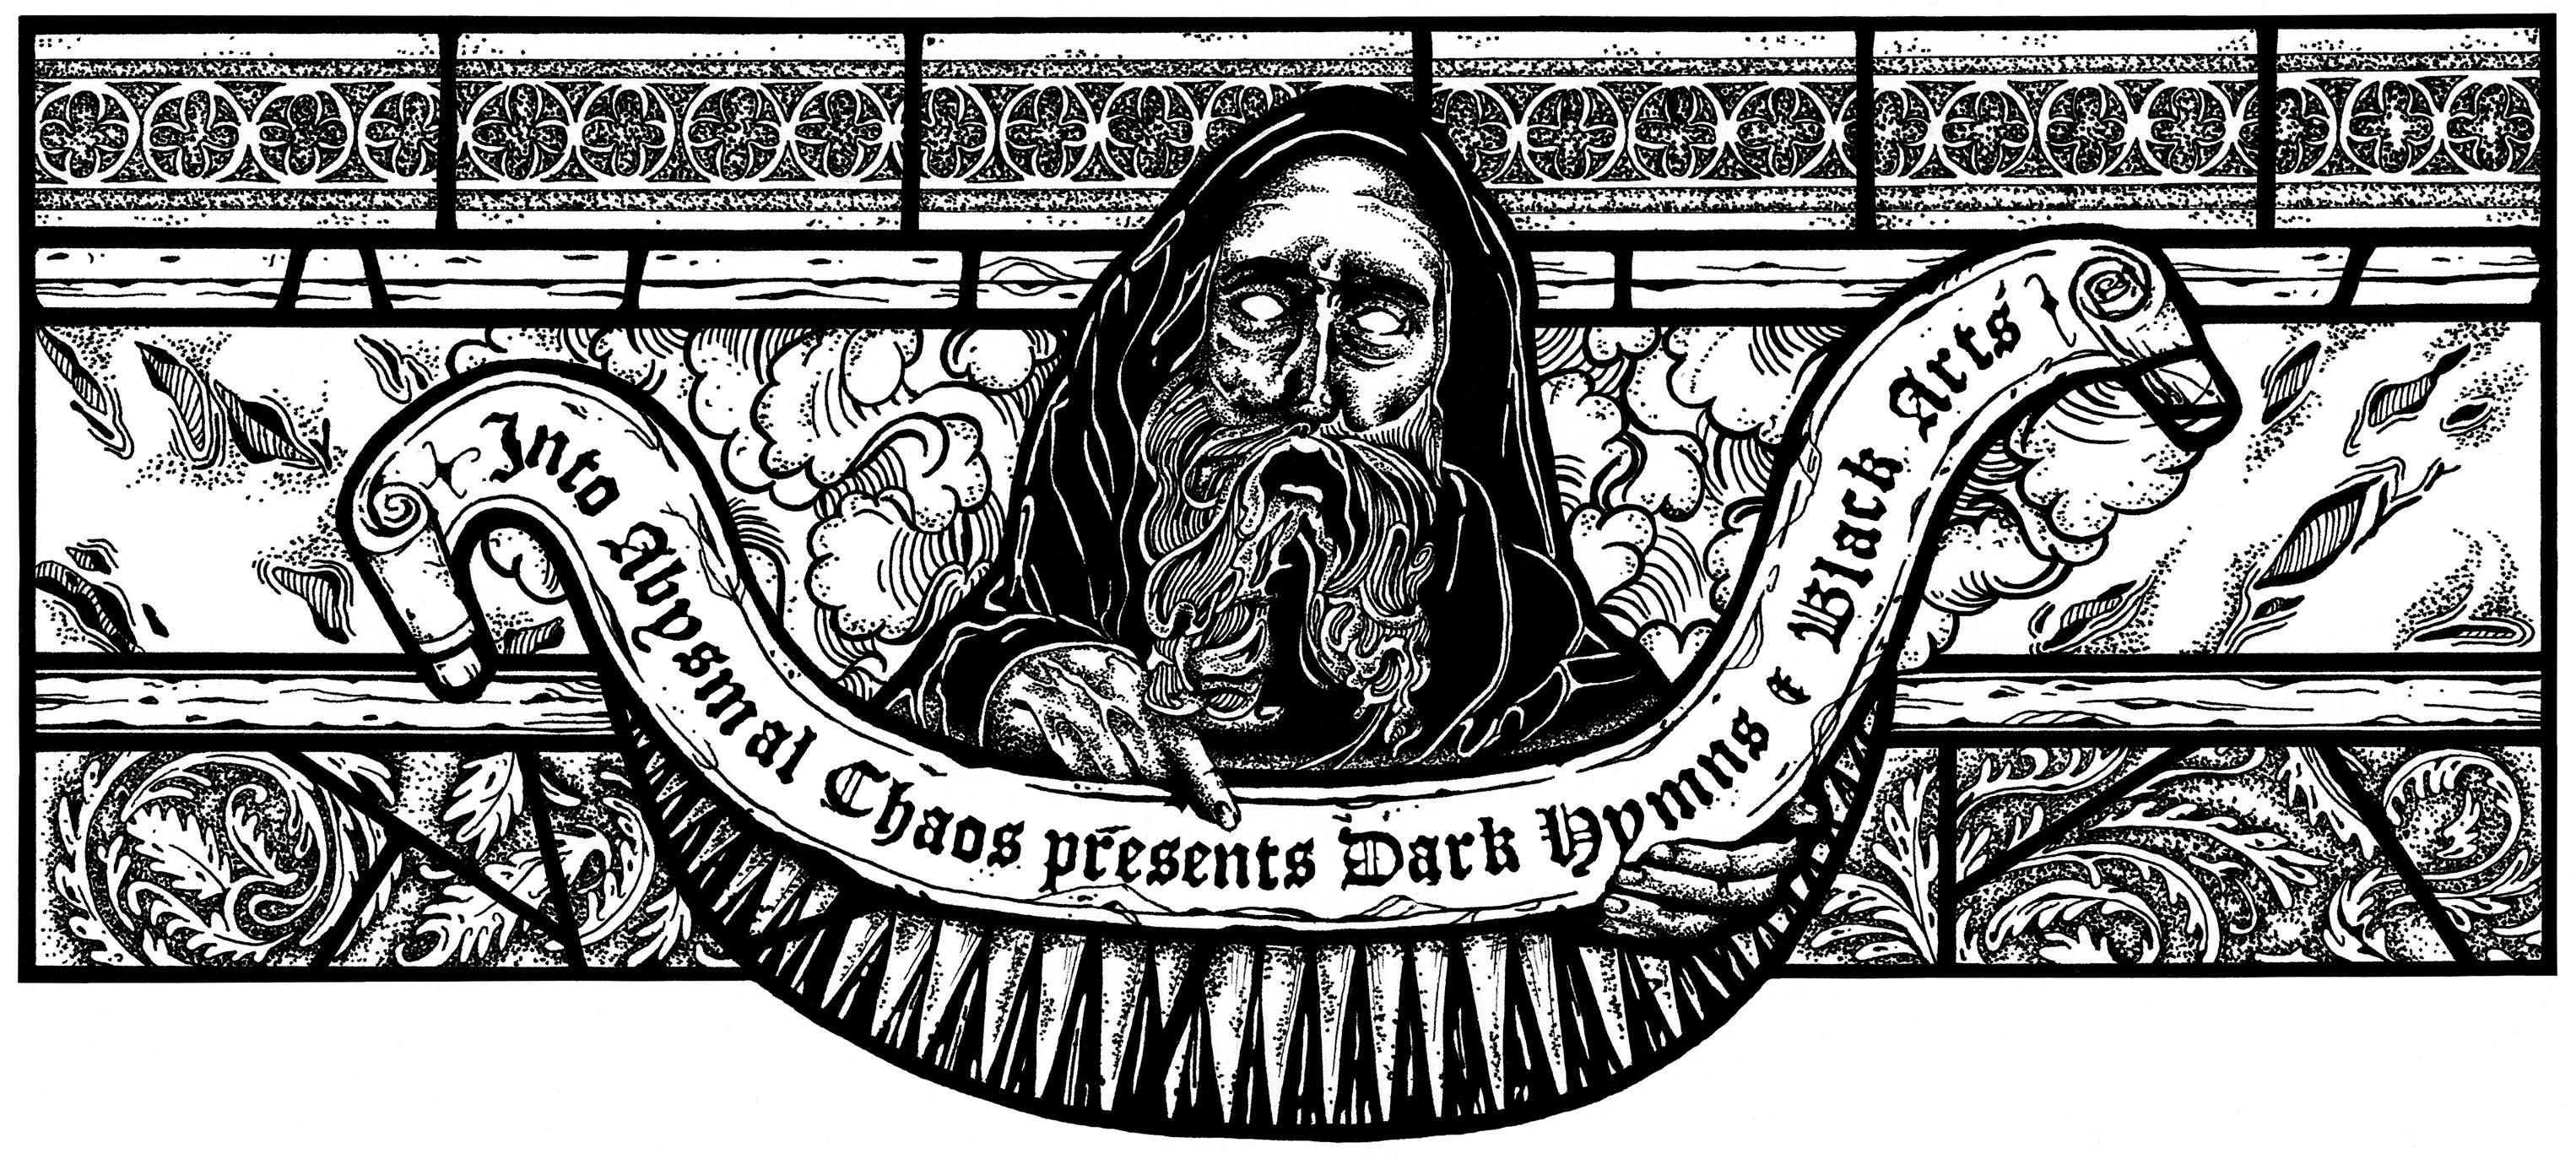 Dark Hymns and Black Arts, Leipzig 29.11.2014